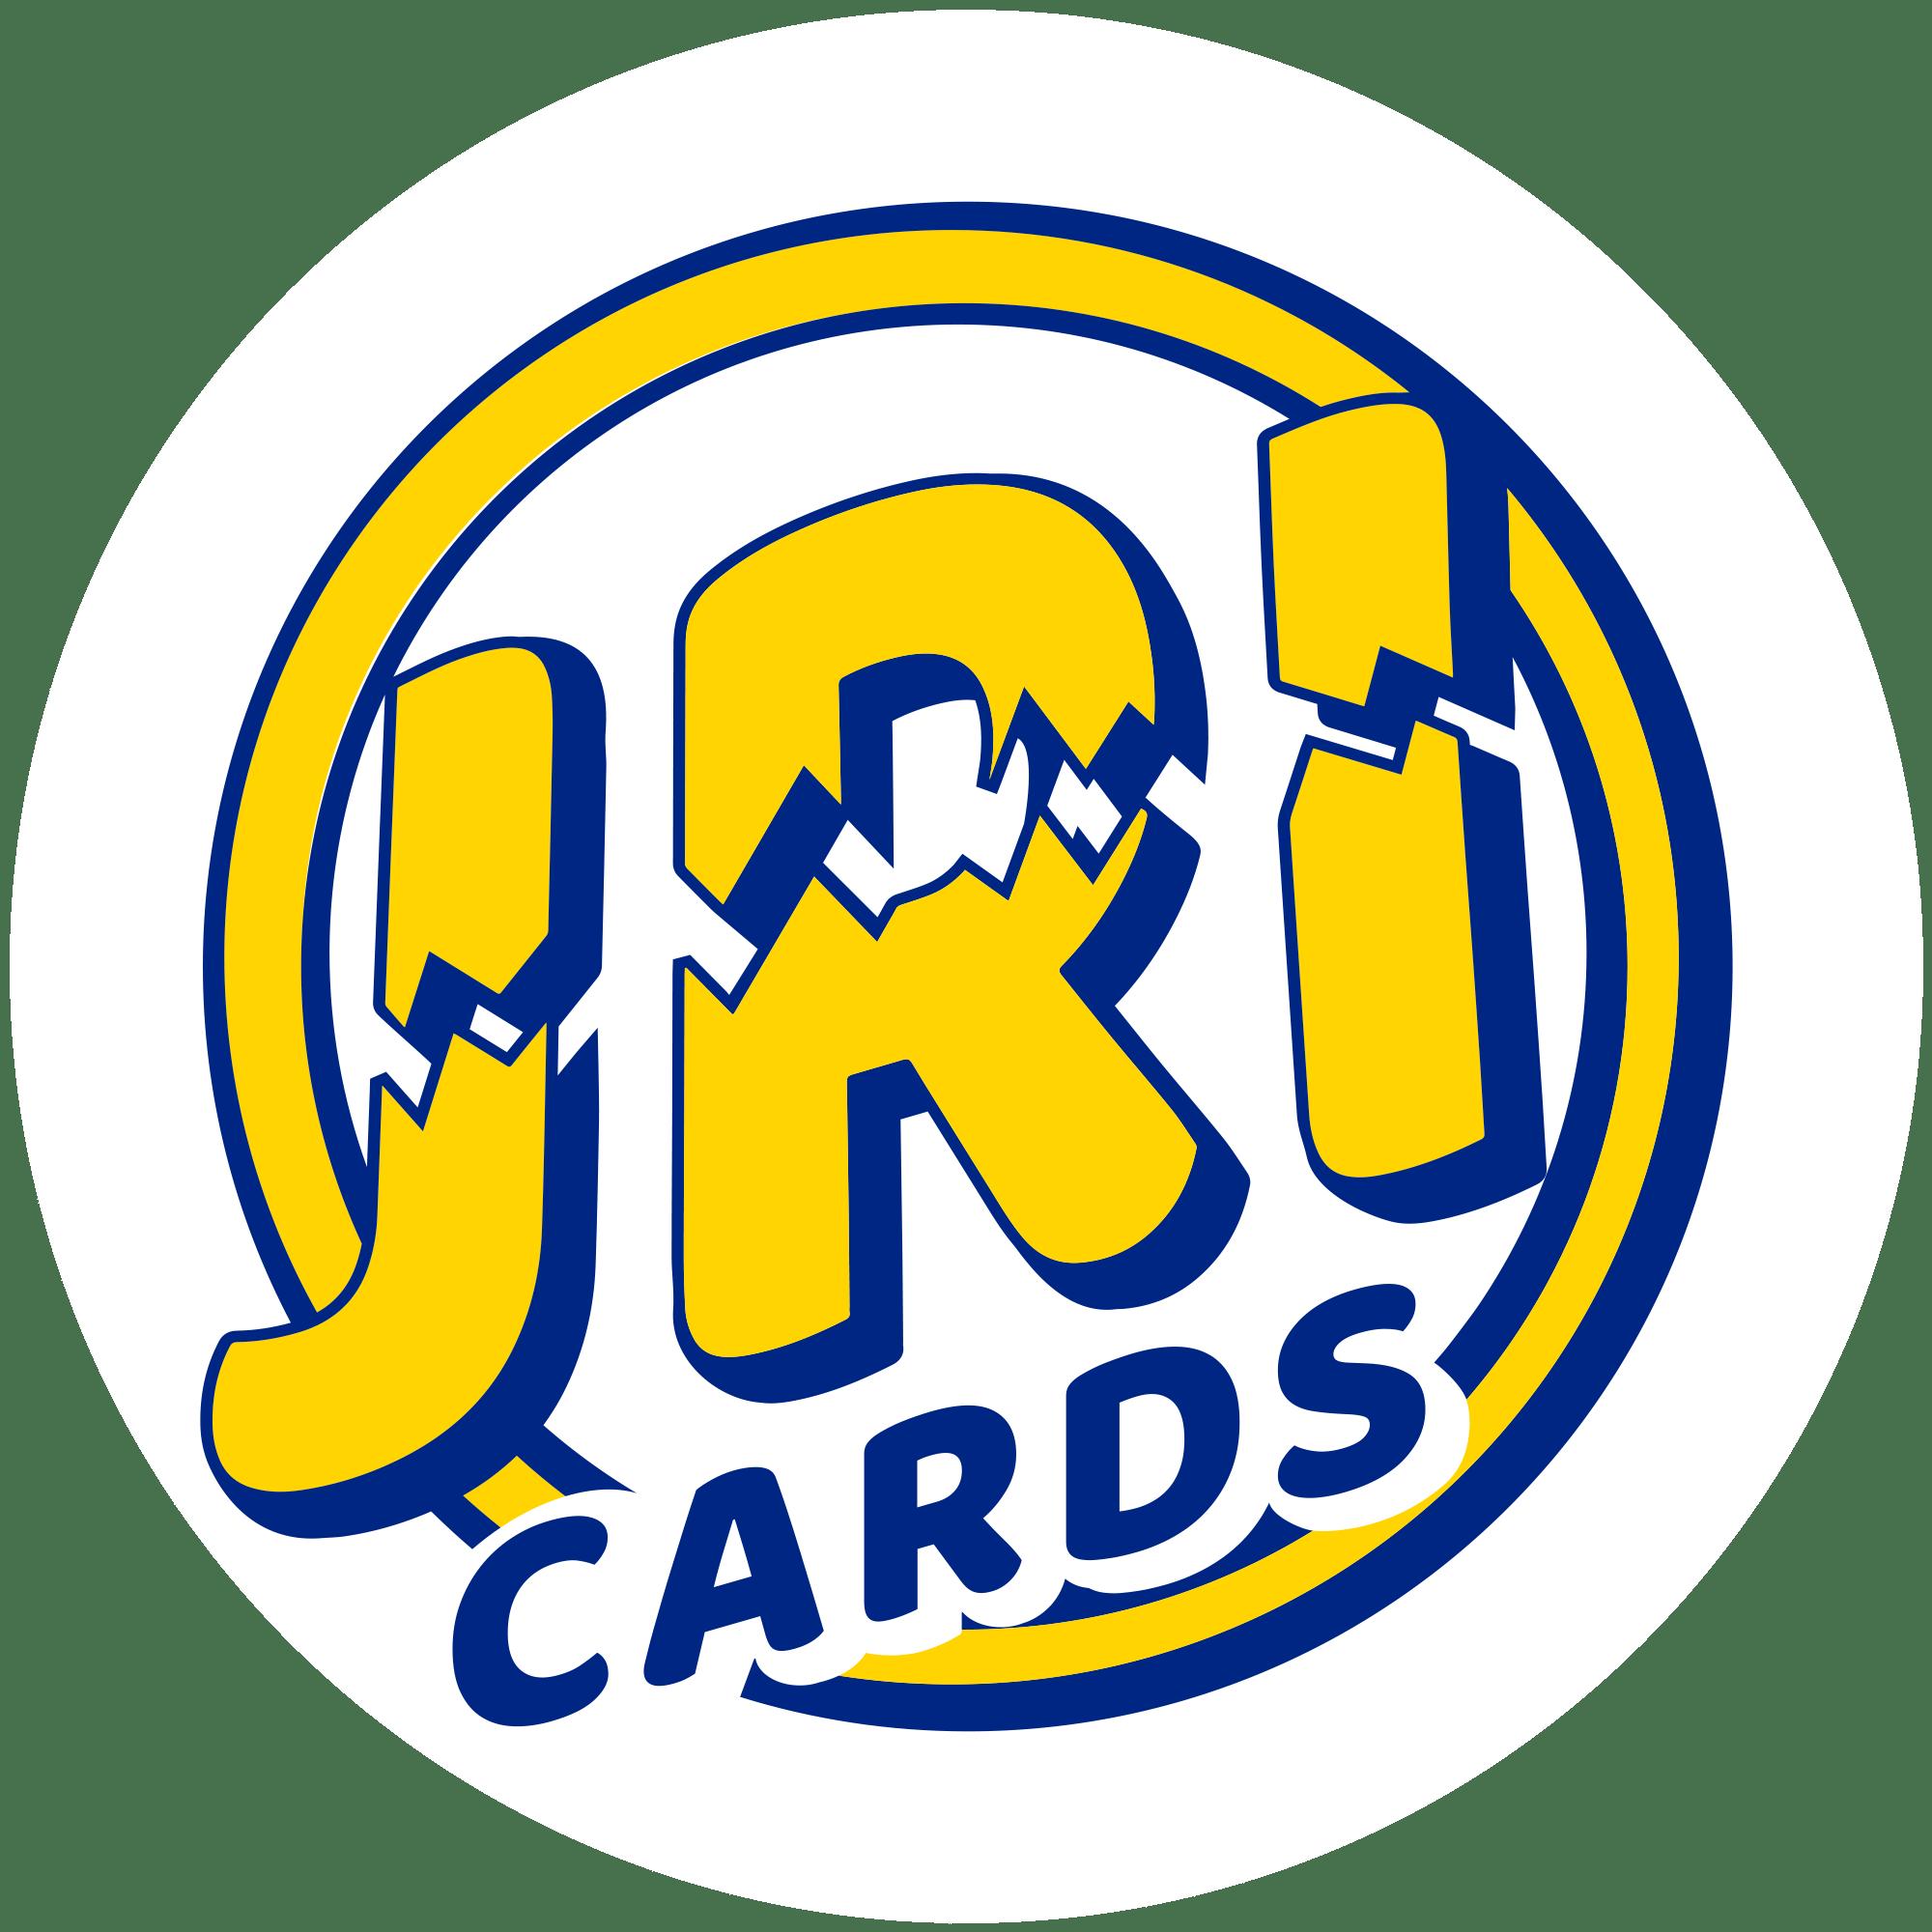 2019 PANINI CONTENDERS BASKETBALL HOBBY BOX (12 PACKS AVAILABLE)